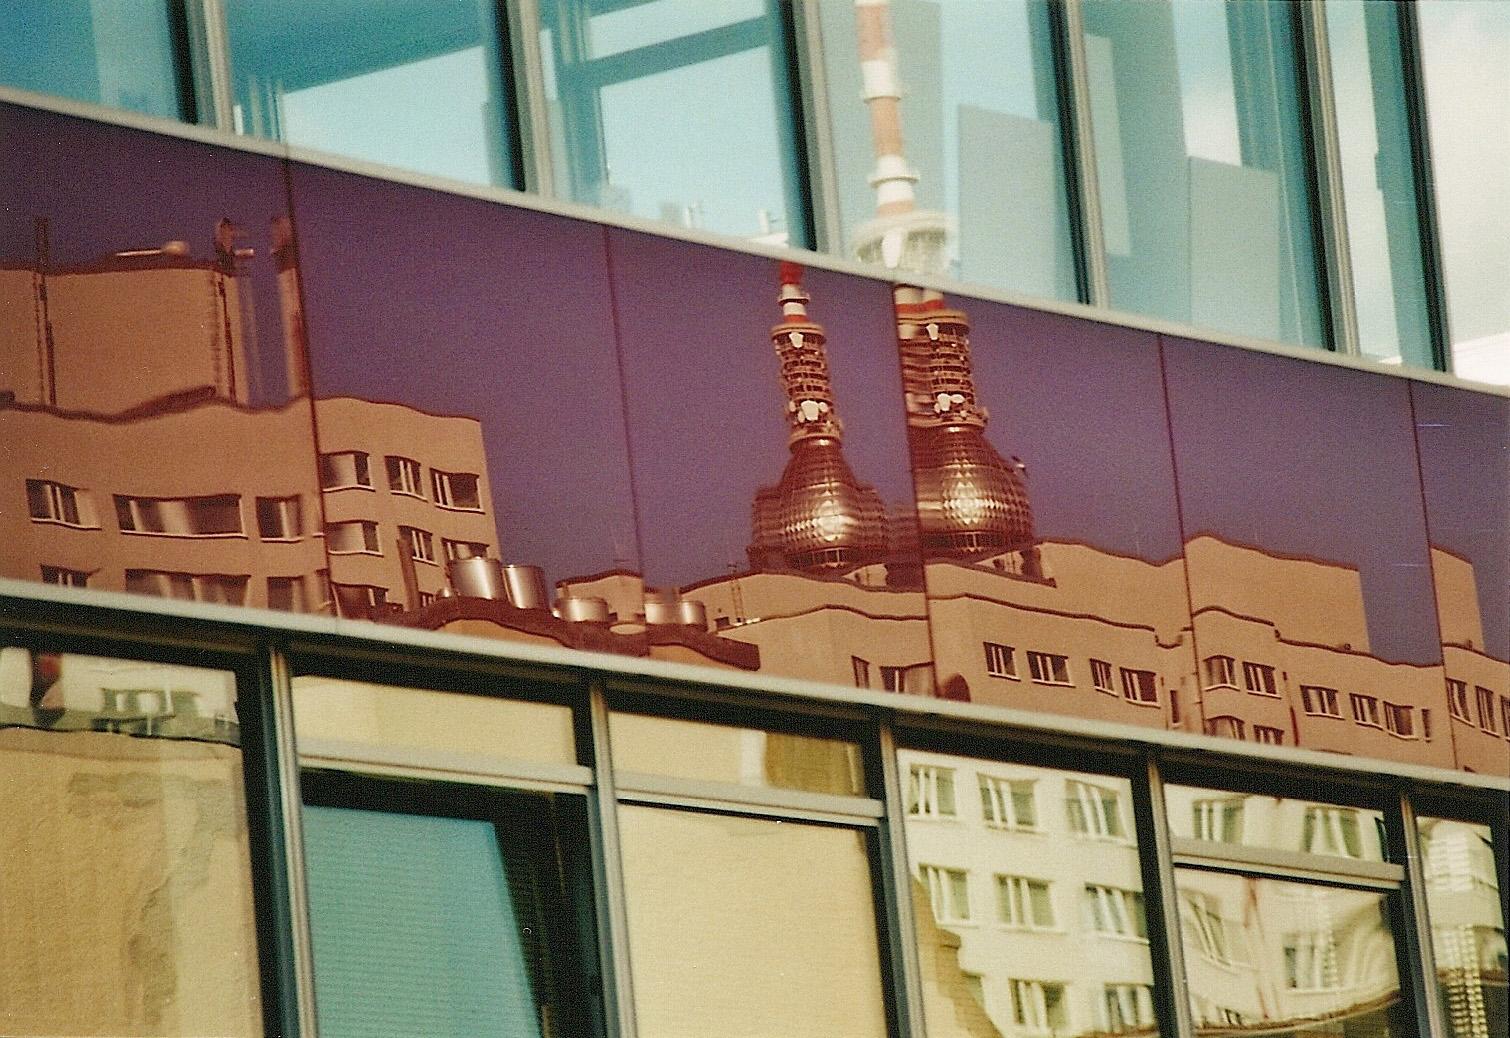 TV Tower / Fernsehturm     Berlin Germany 2011